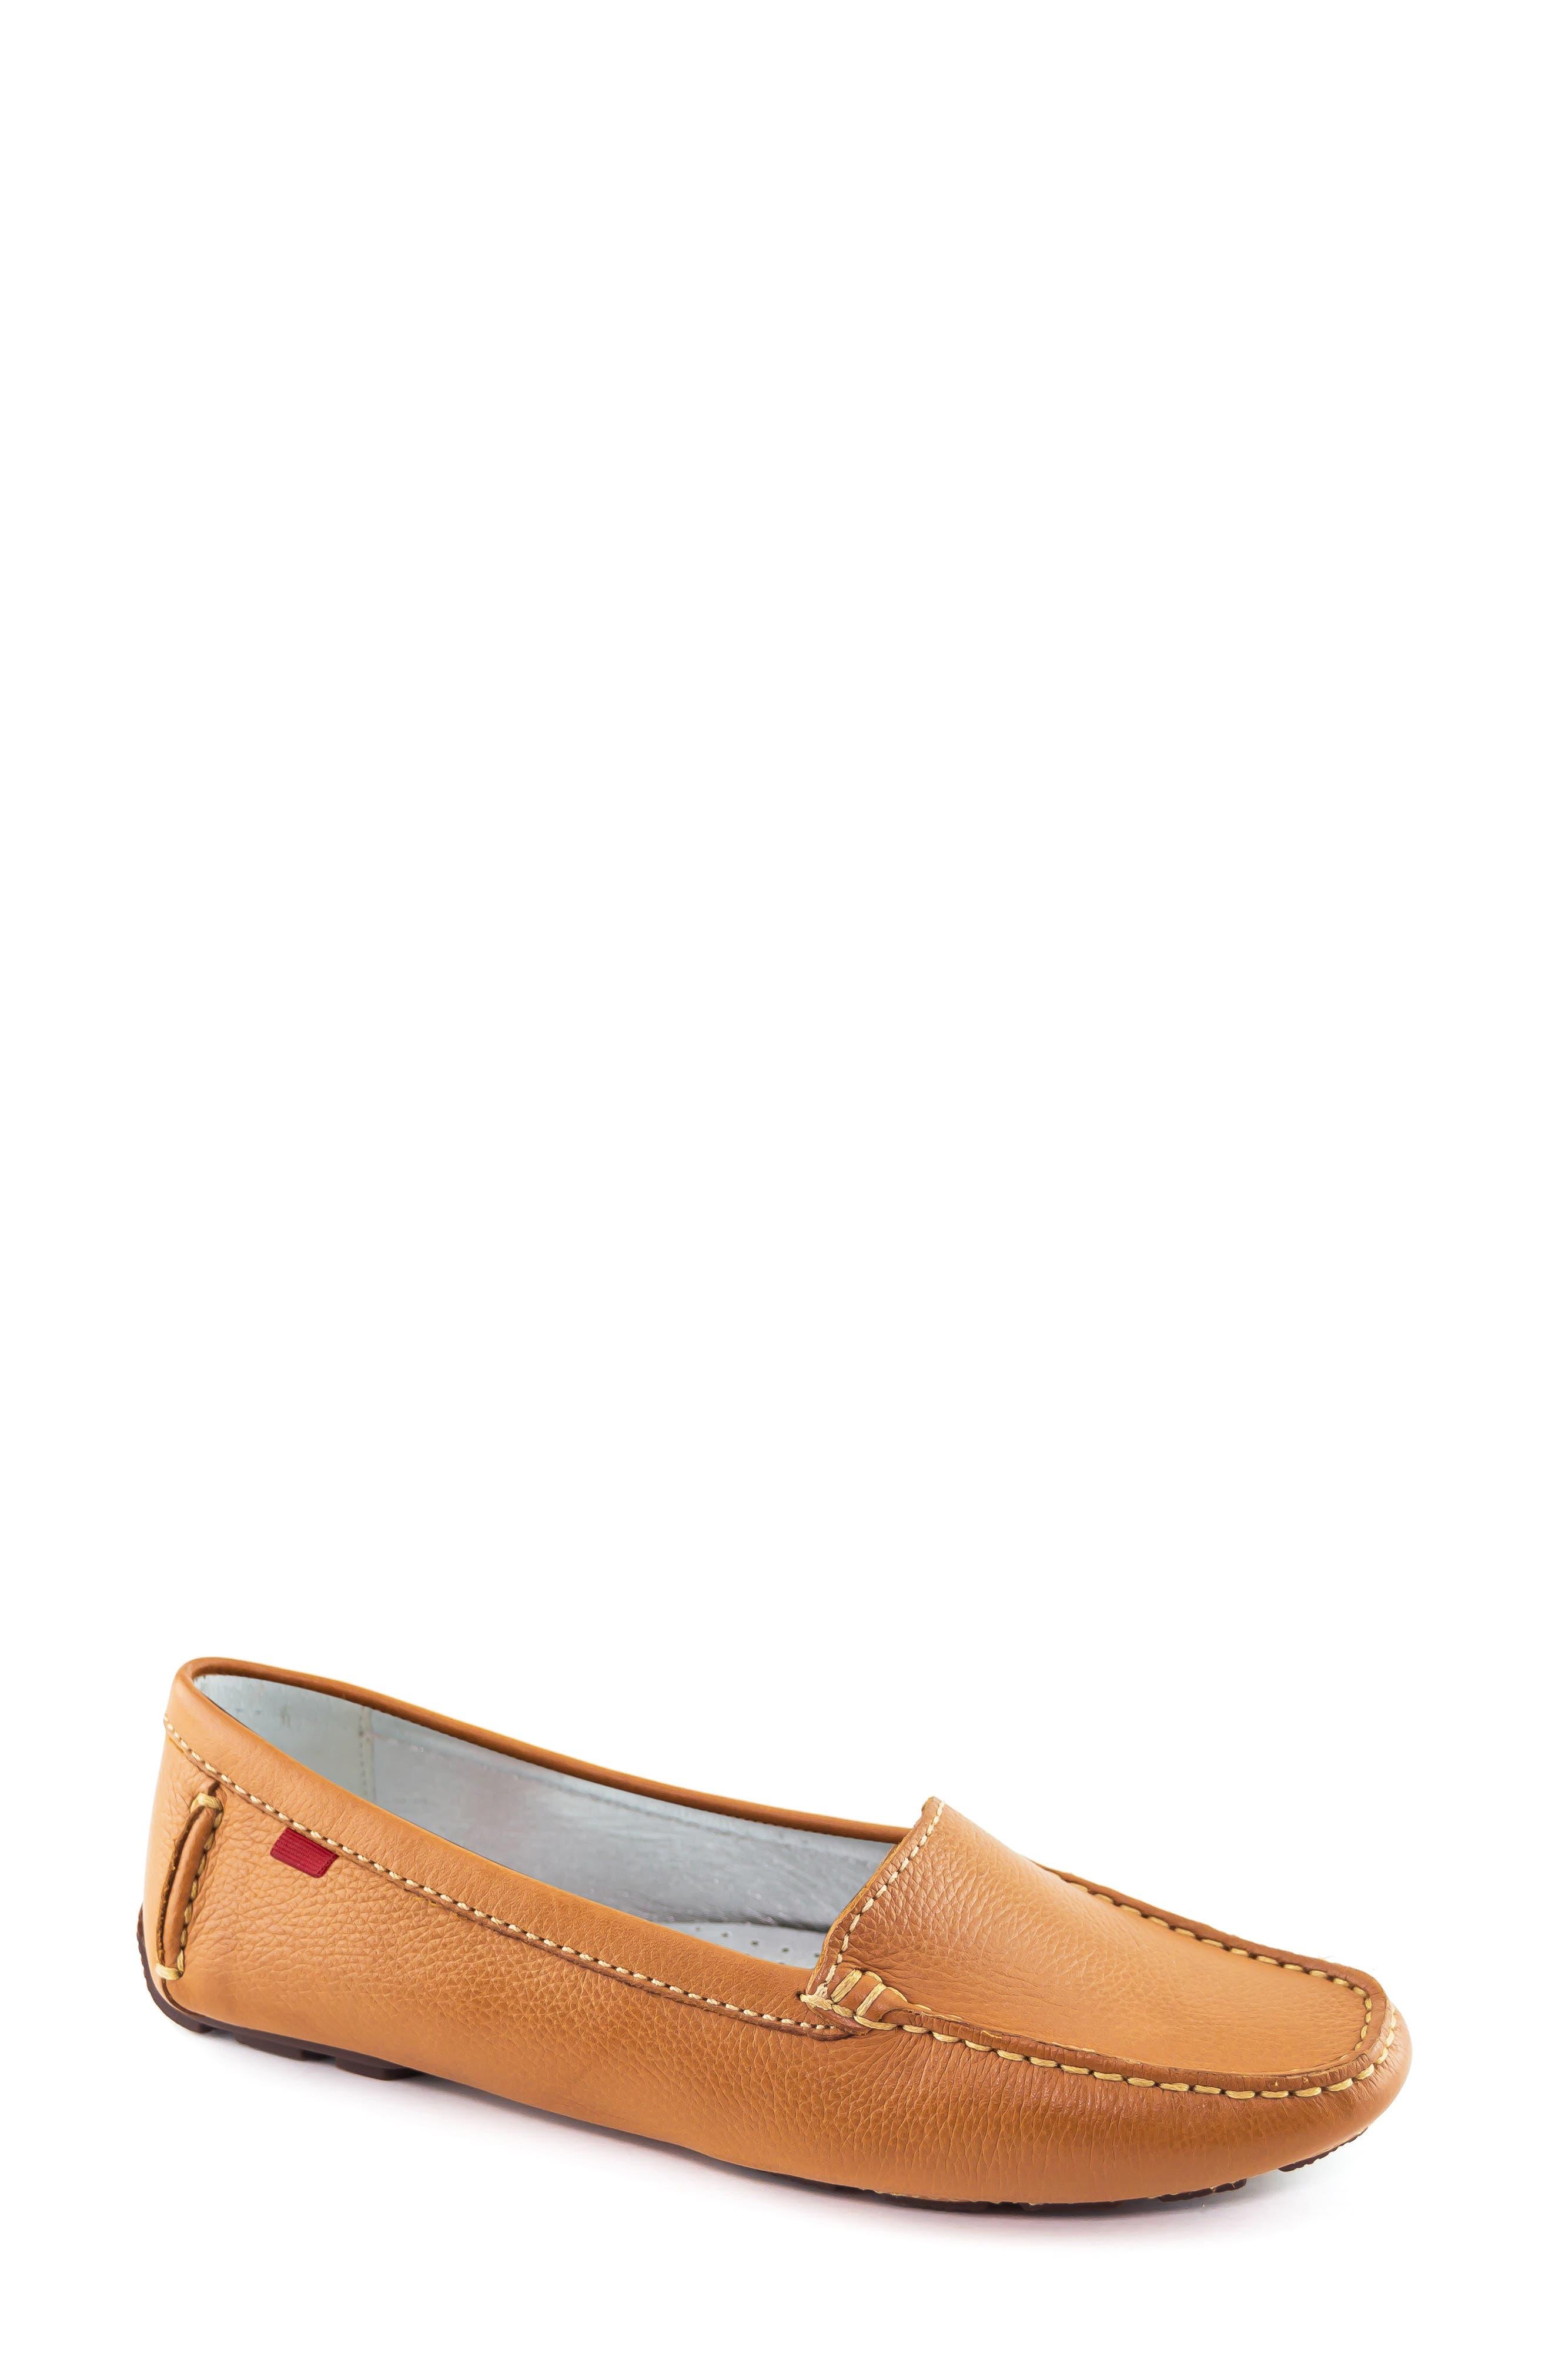 Manhasset Loafer, Main, color, TAN/ NATURAL LEATHER